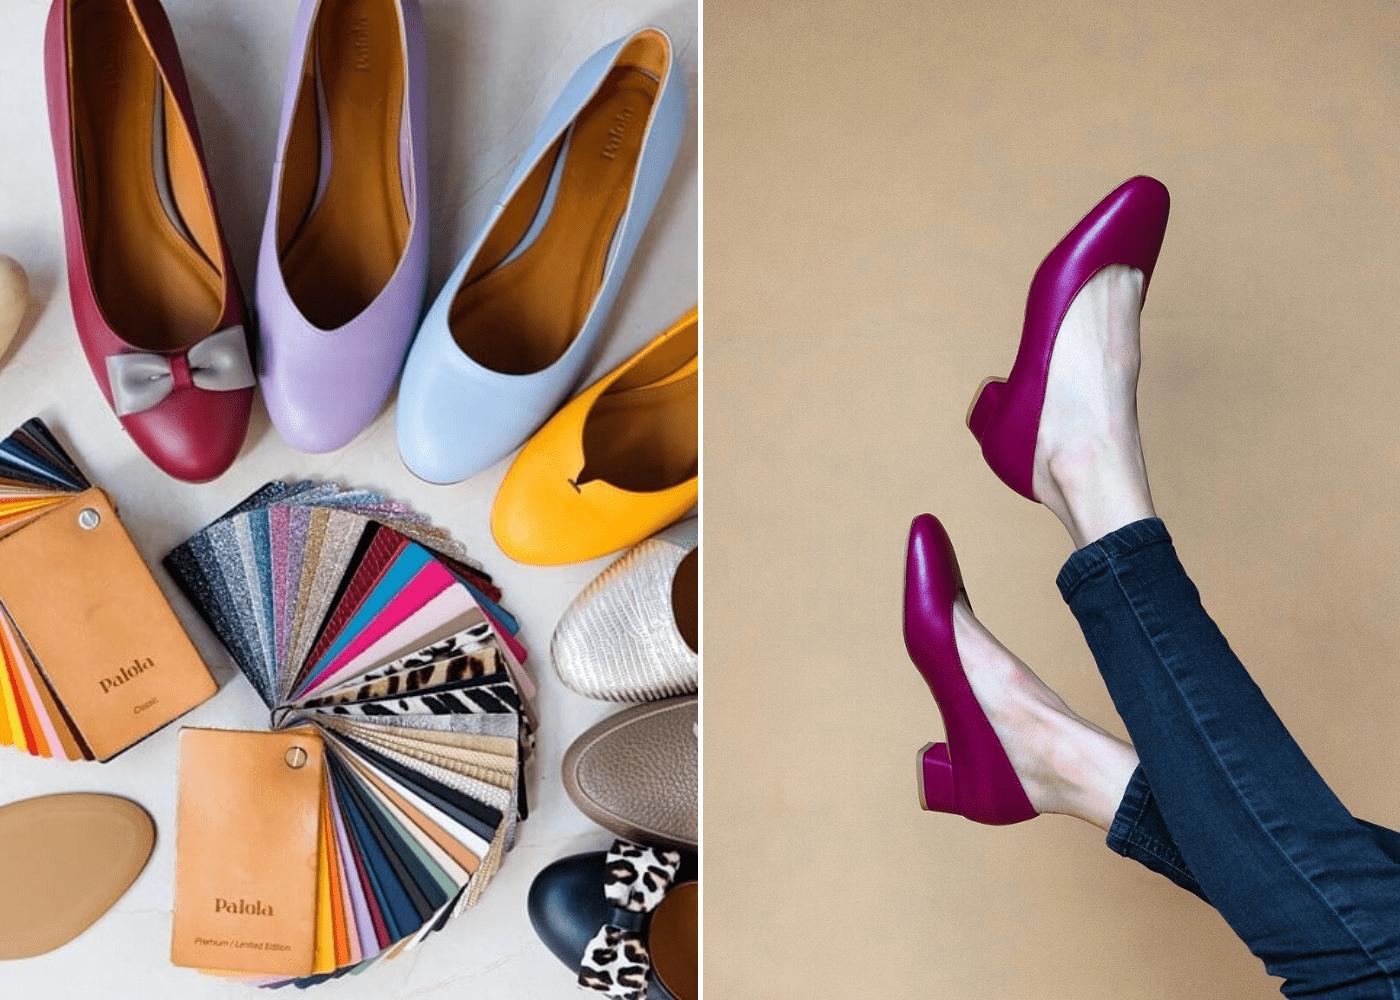 Palola shoes